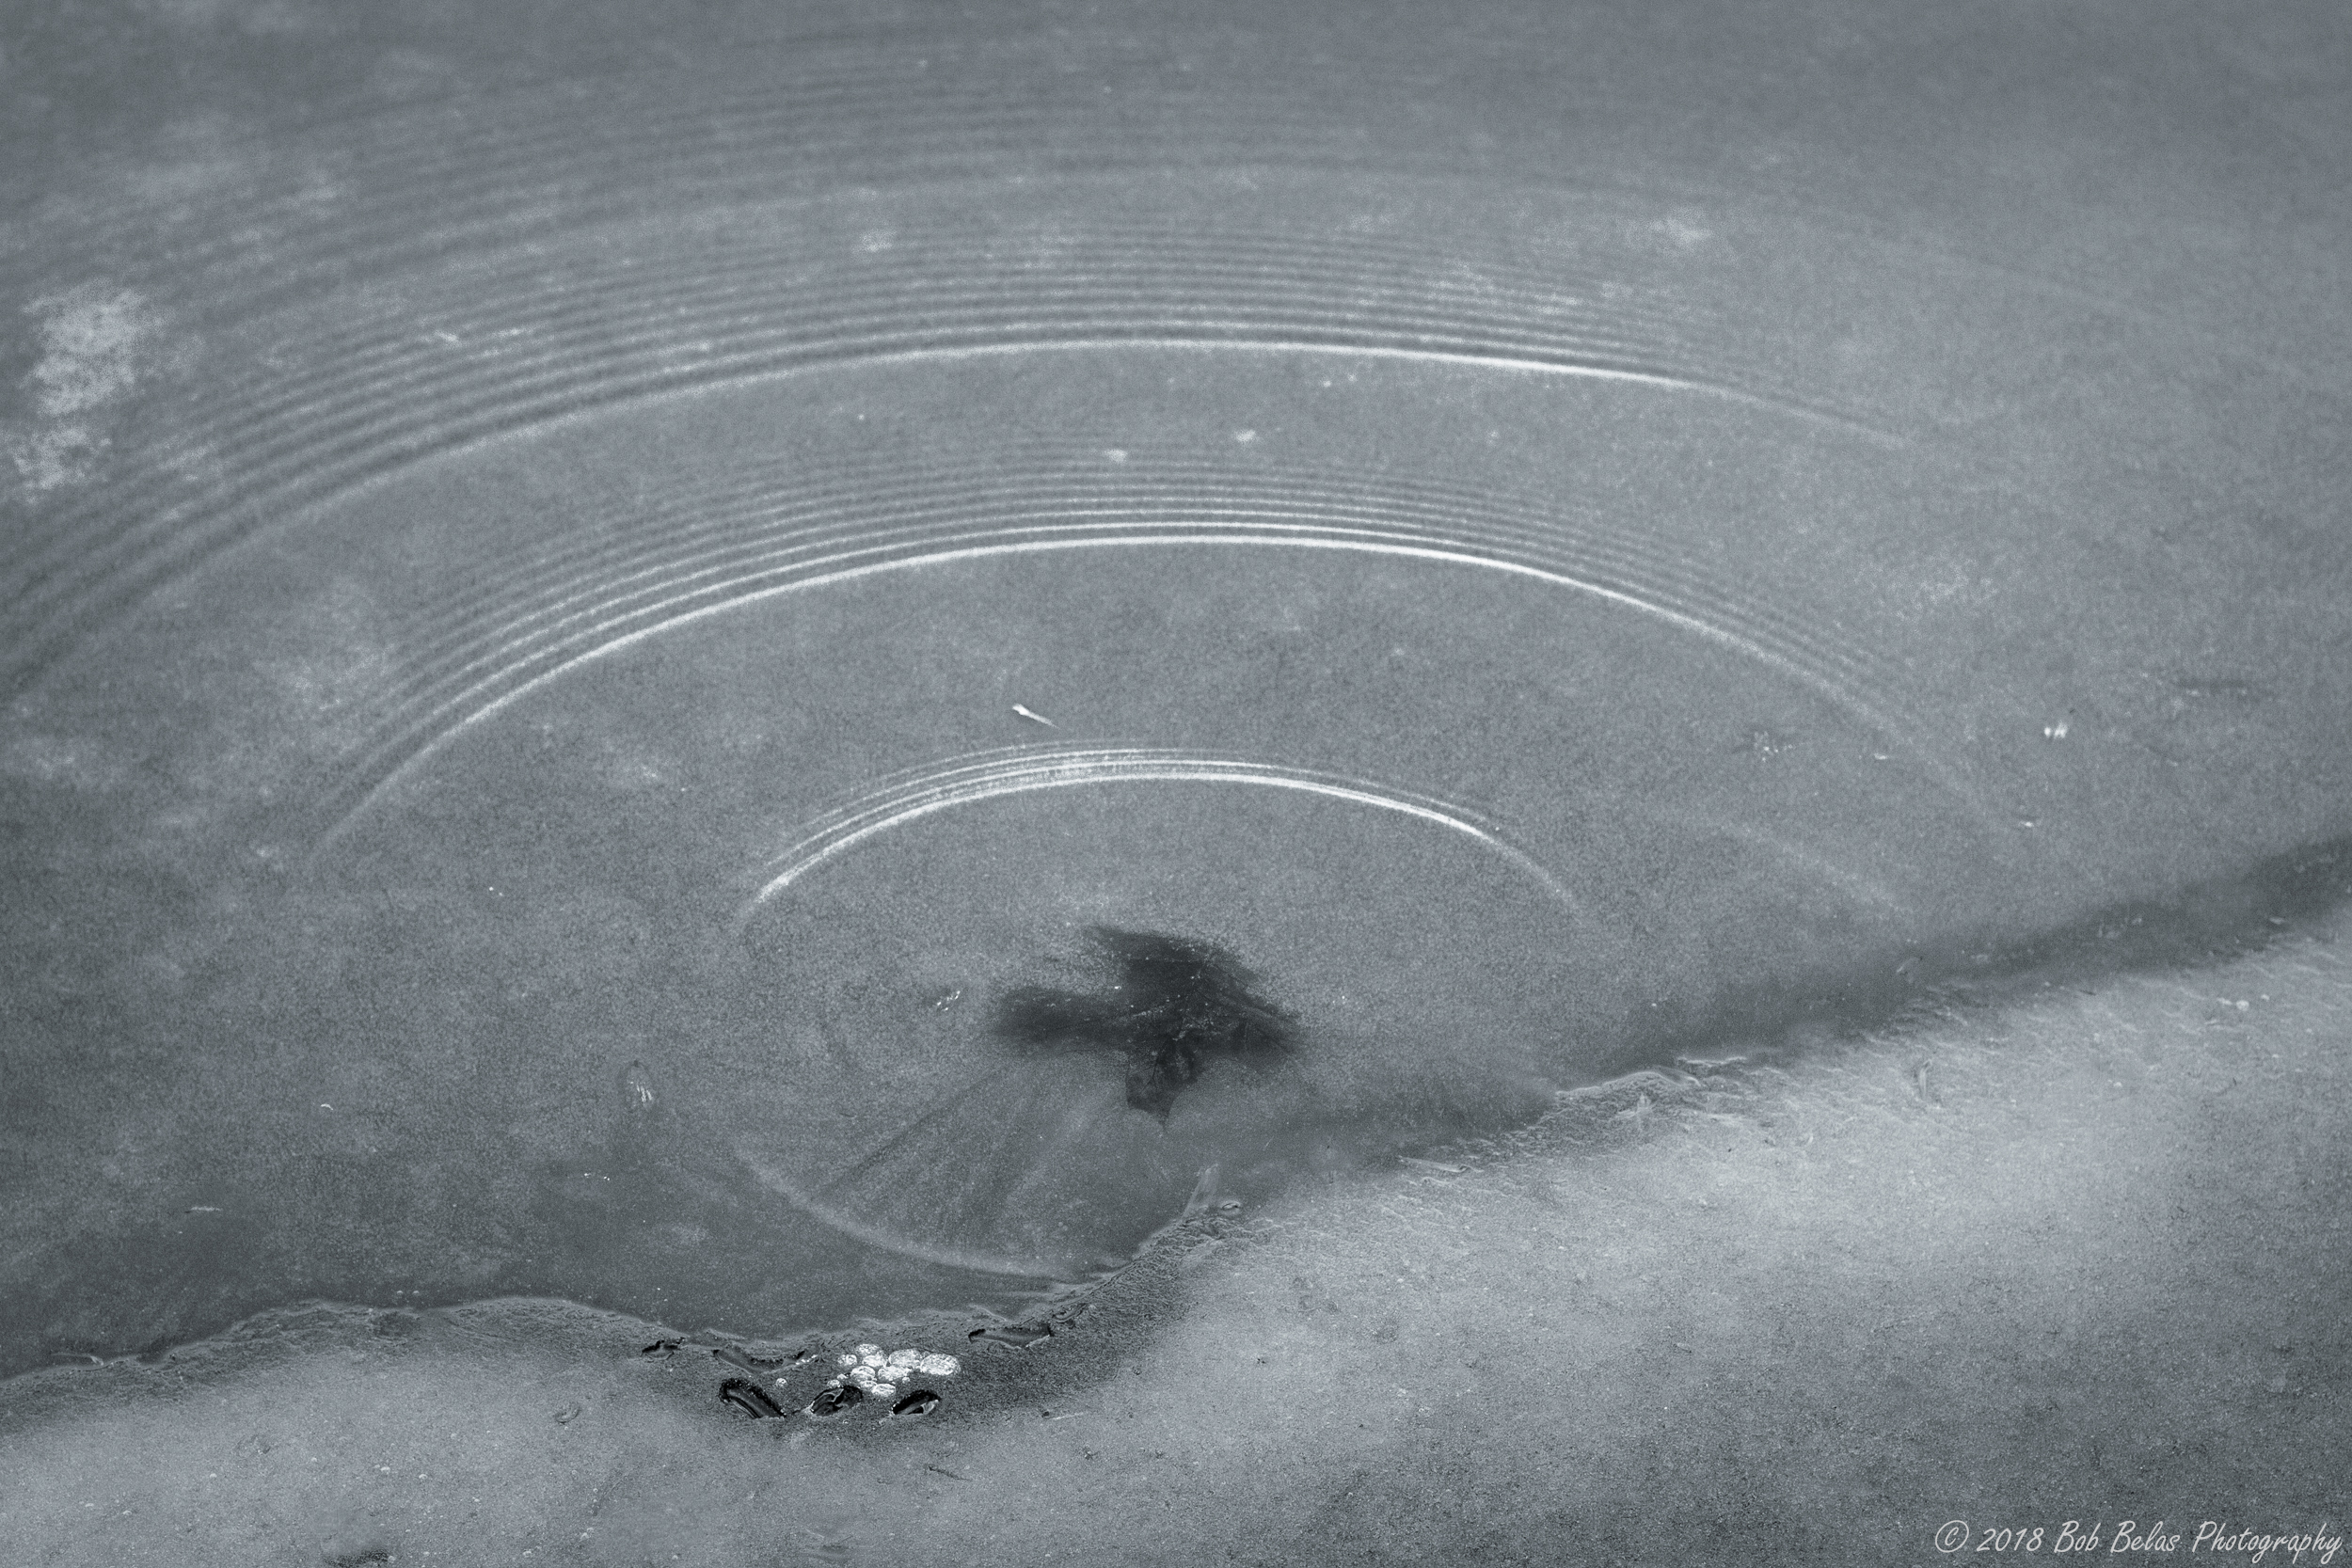 Ice Dream 5, monochrome